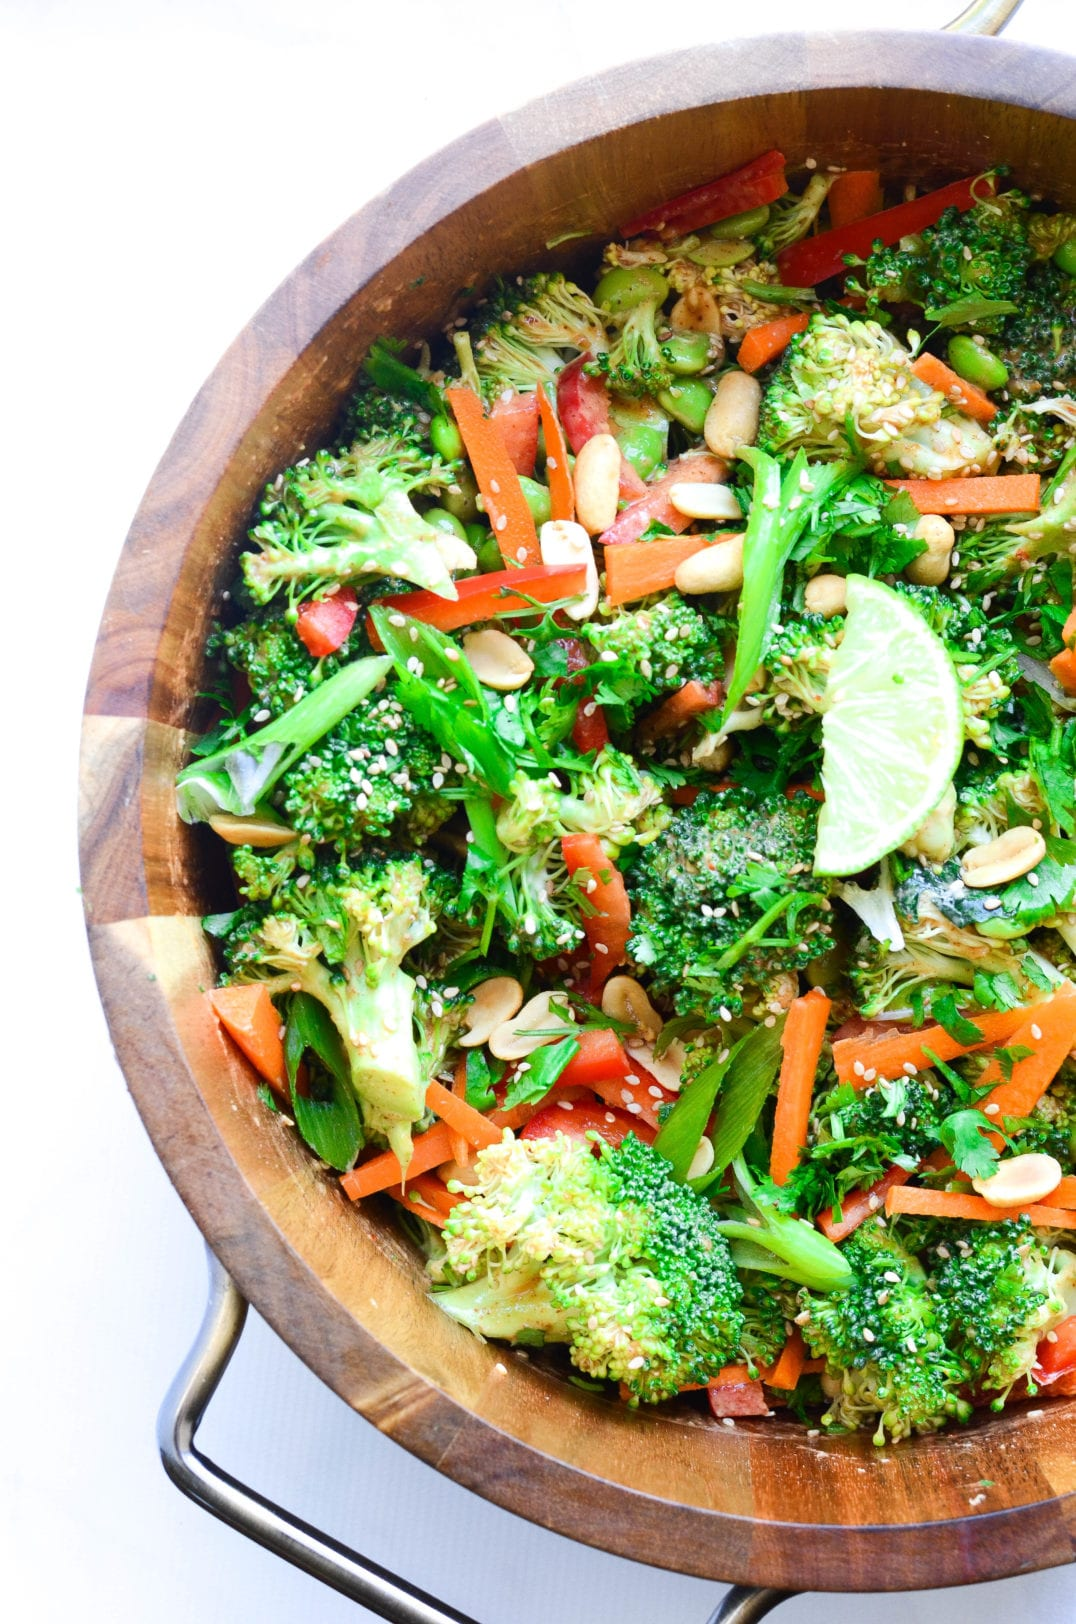 Thai Broccoli Salad With Spicy Peanut Dressing